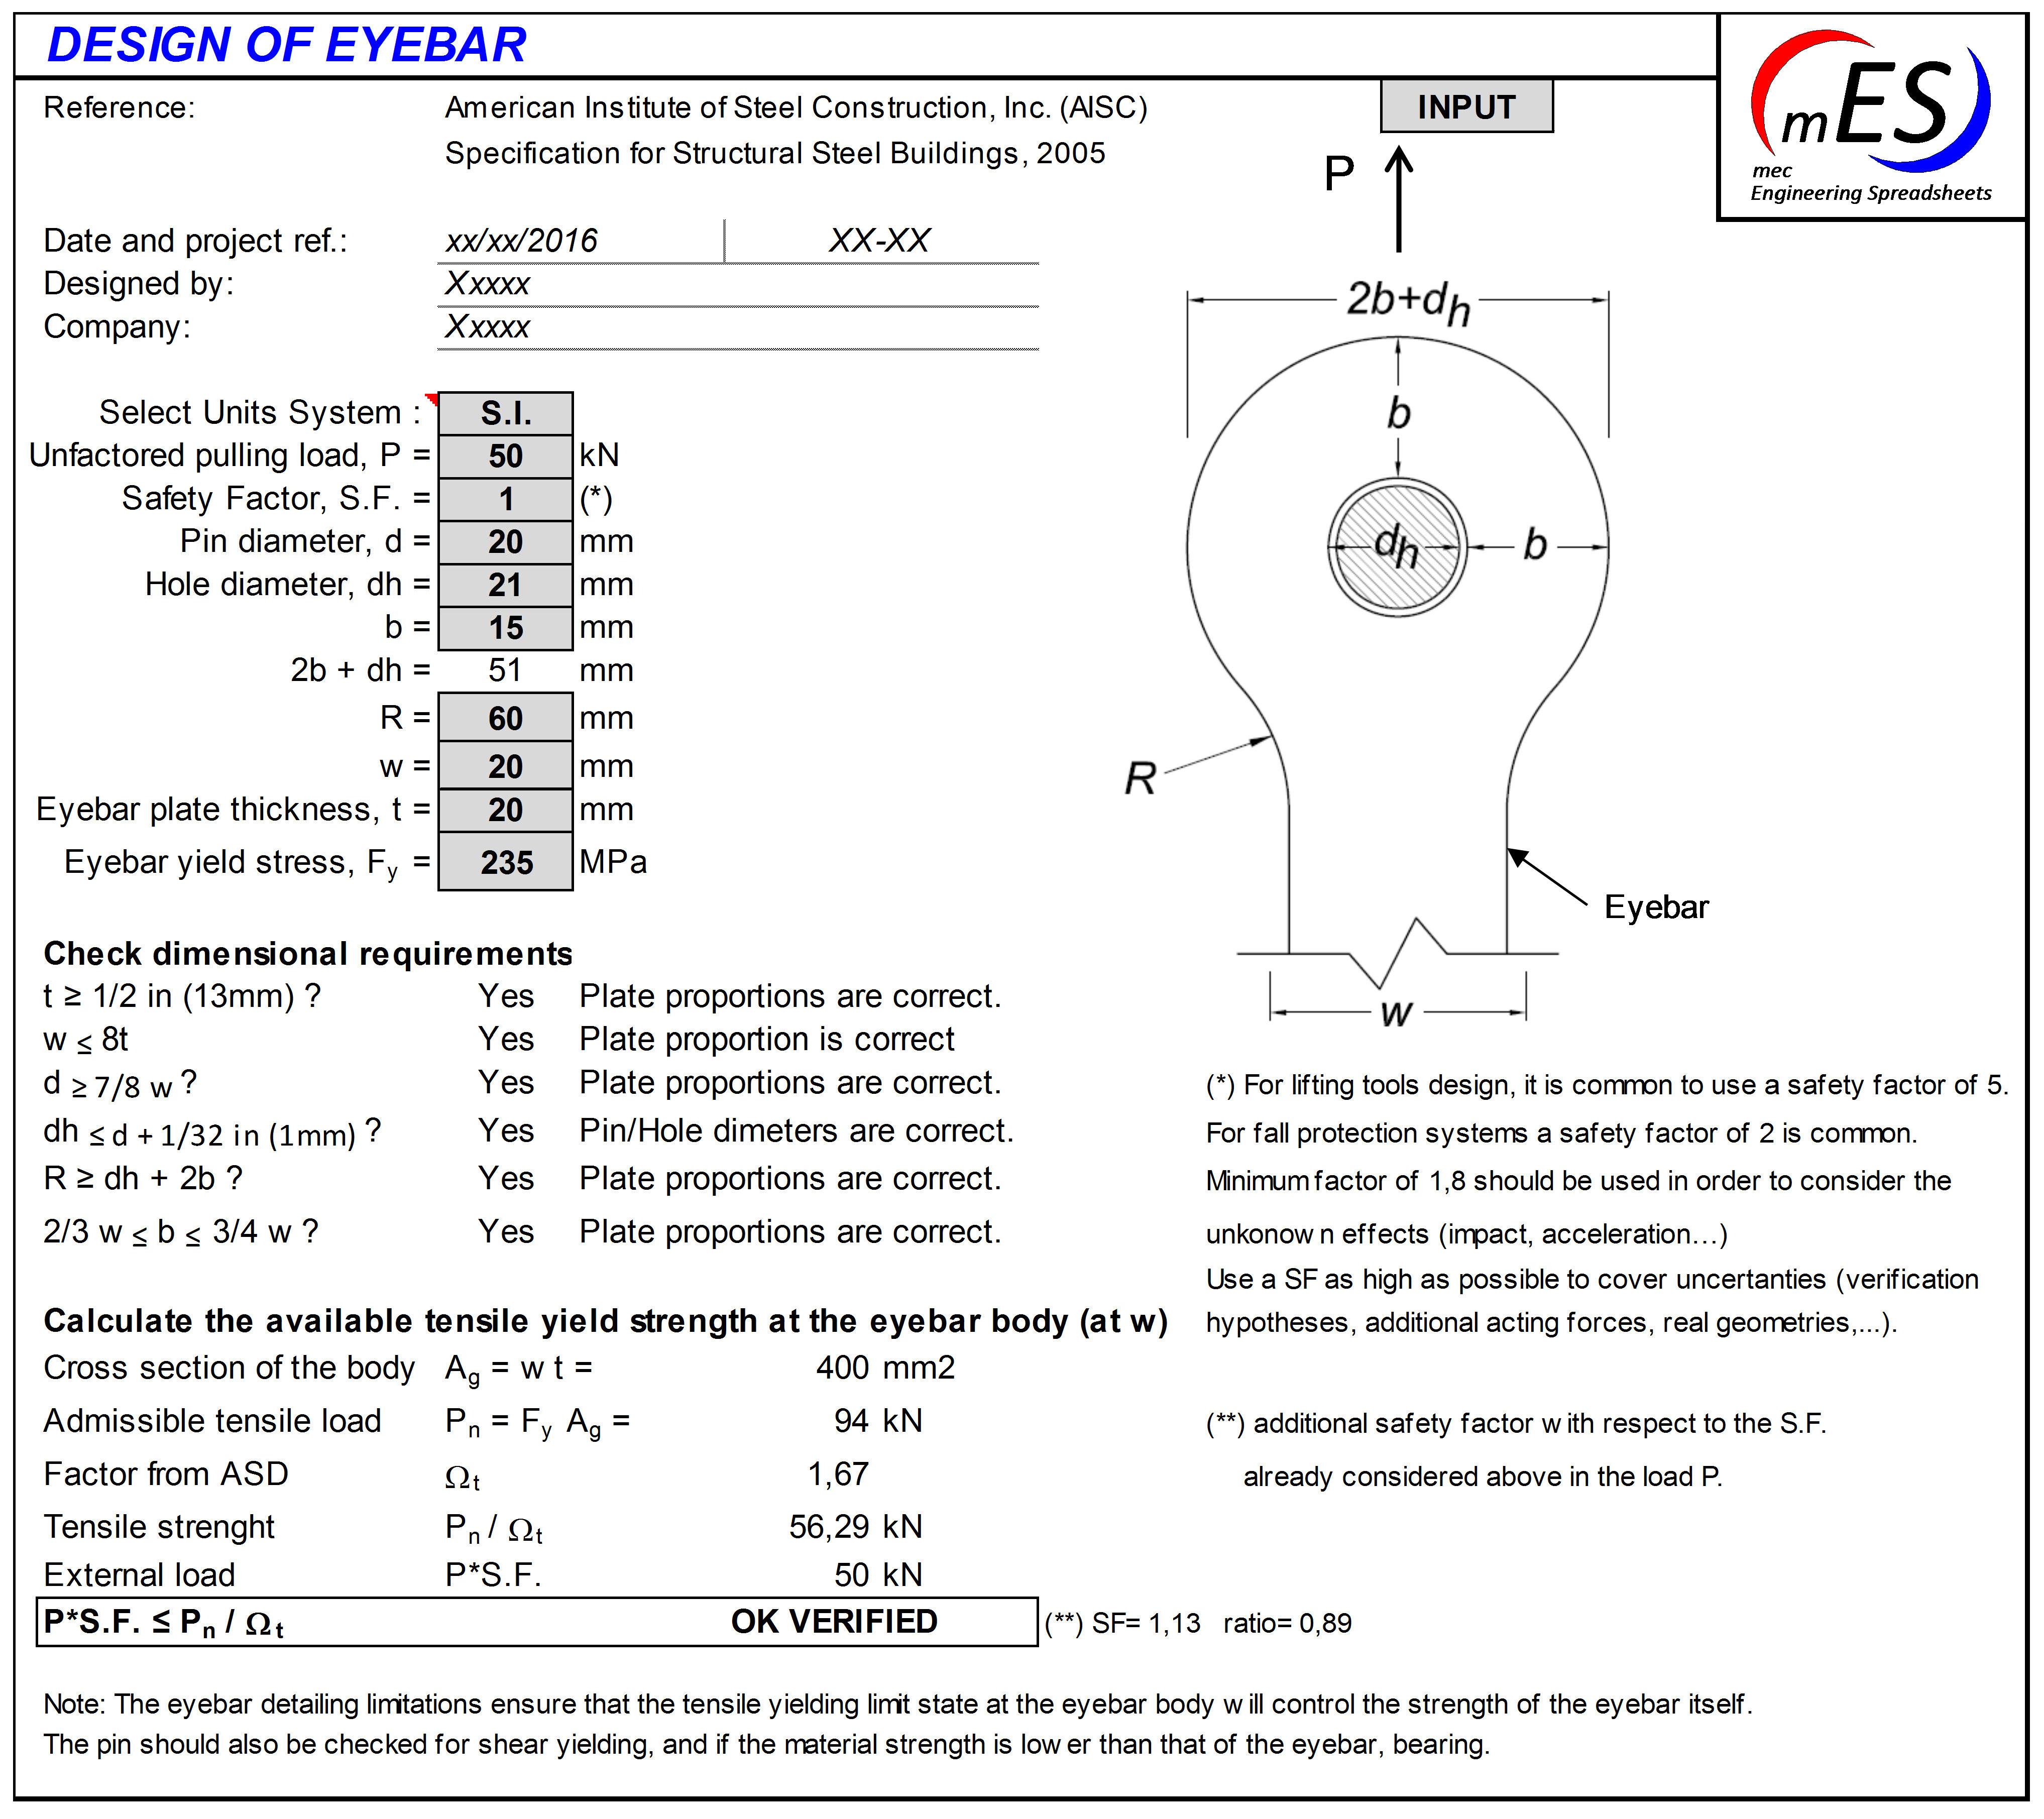 Eyebar design - mec Engineering Spreadsheets